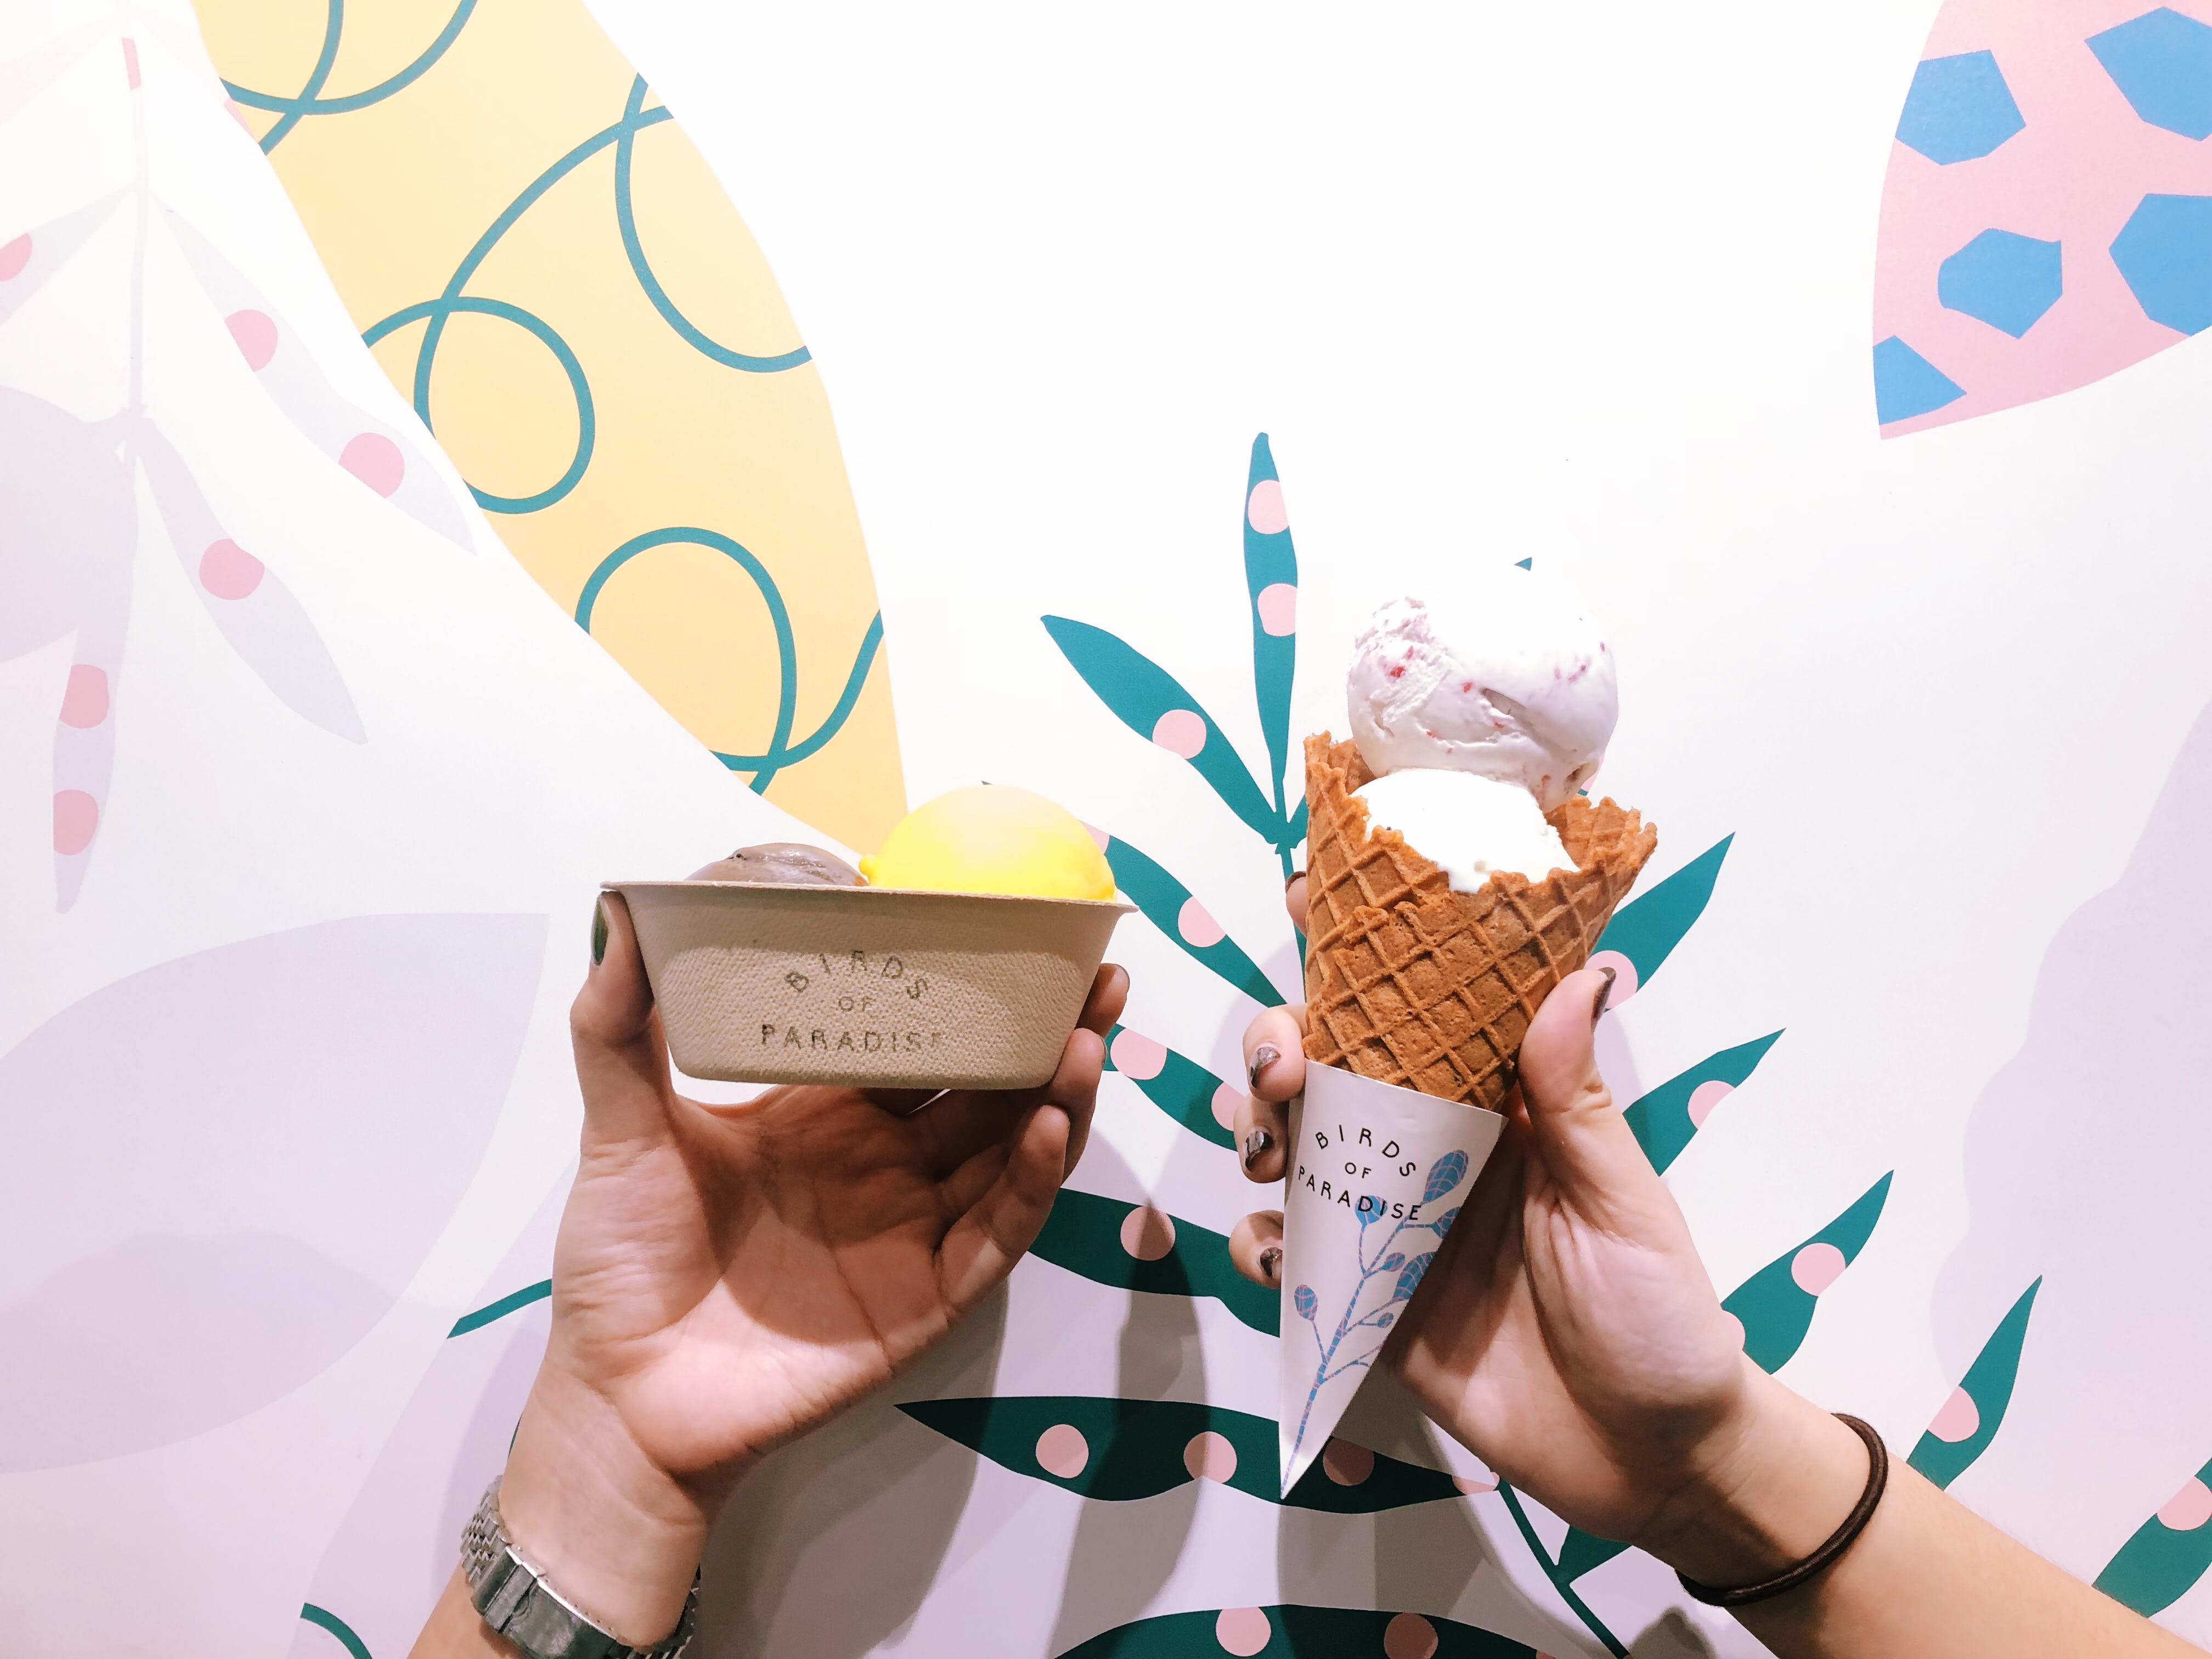 kem gelato tại birds of paradise